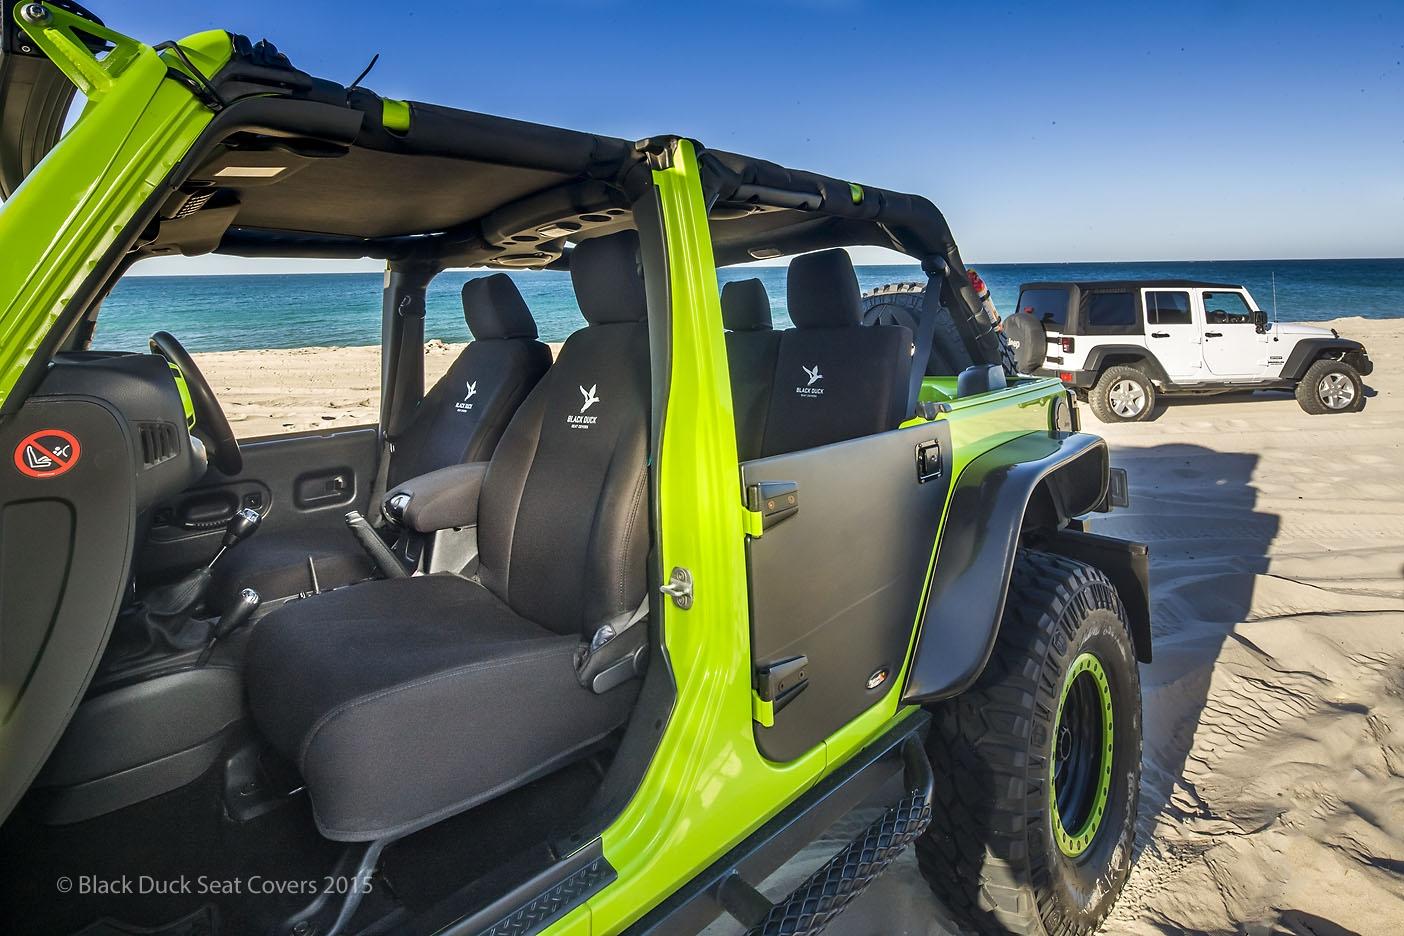 Superb Black Duck Seat Covers Chrysler Jk Jeep Wrangler Front Rear Machost Co Dining Chair Design Ideas Machostcouk